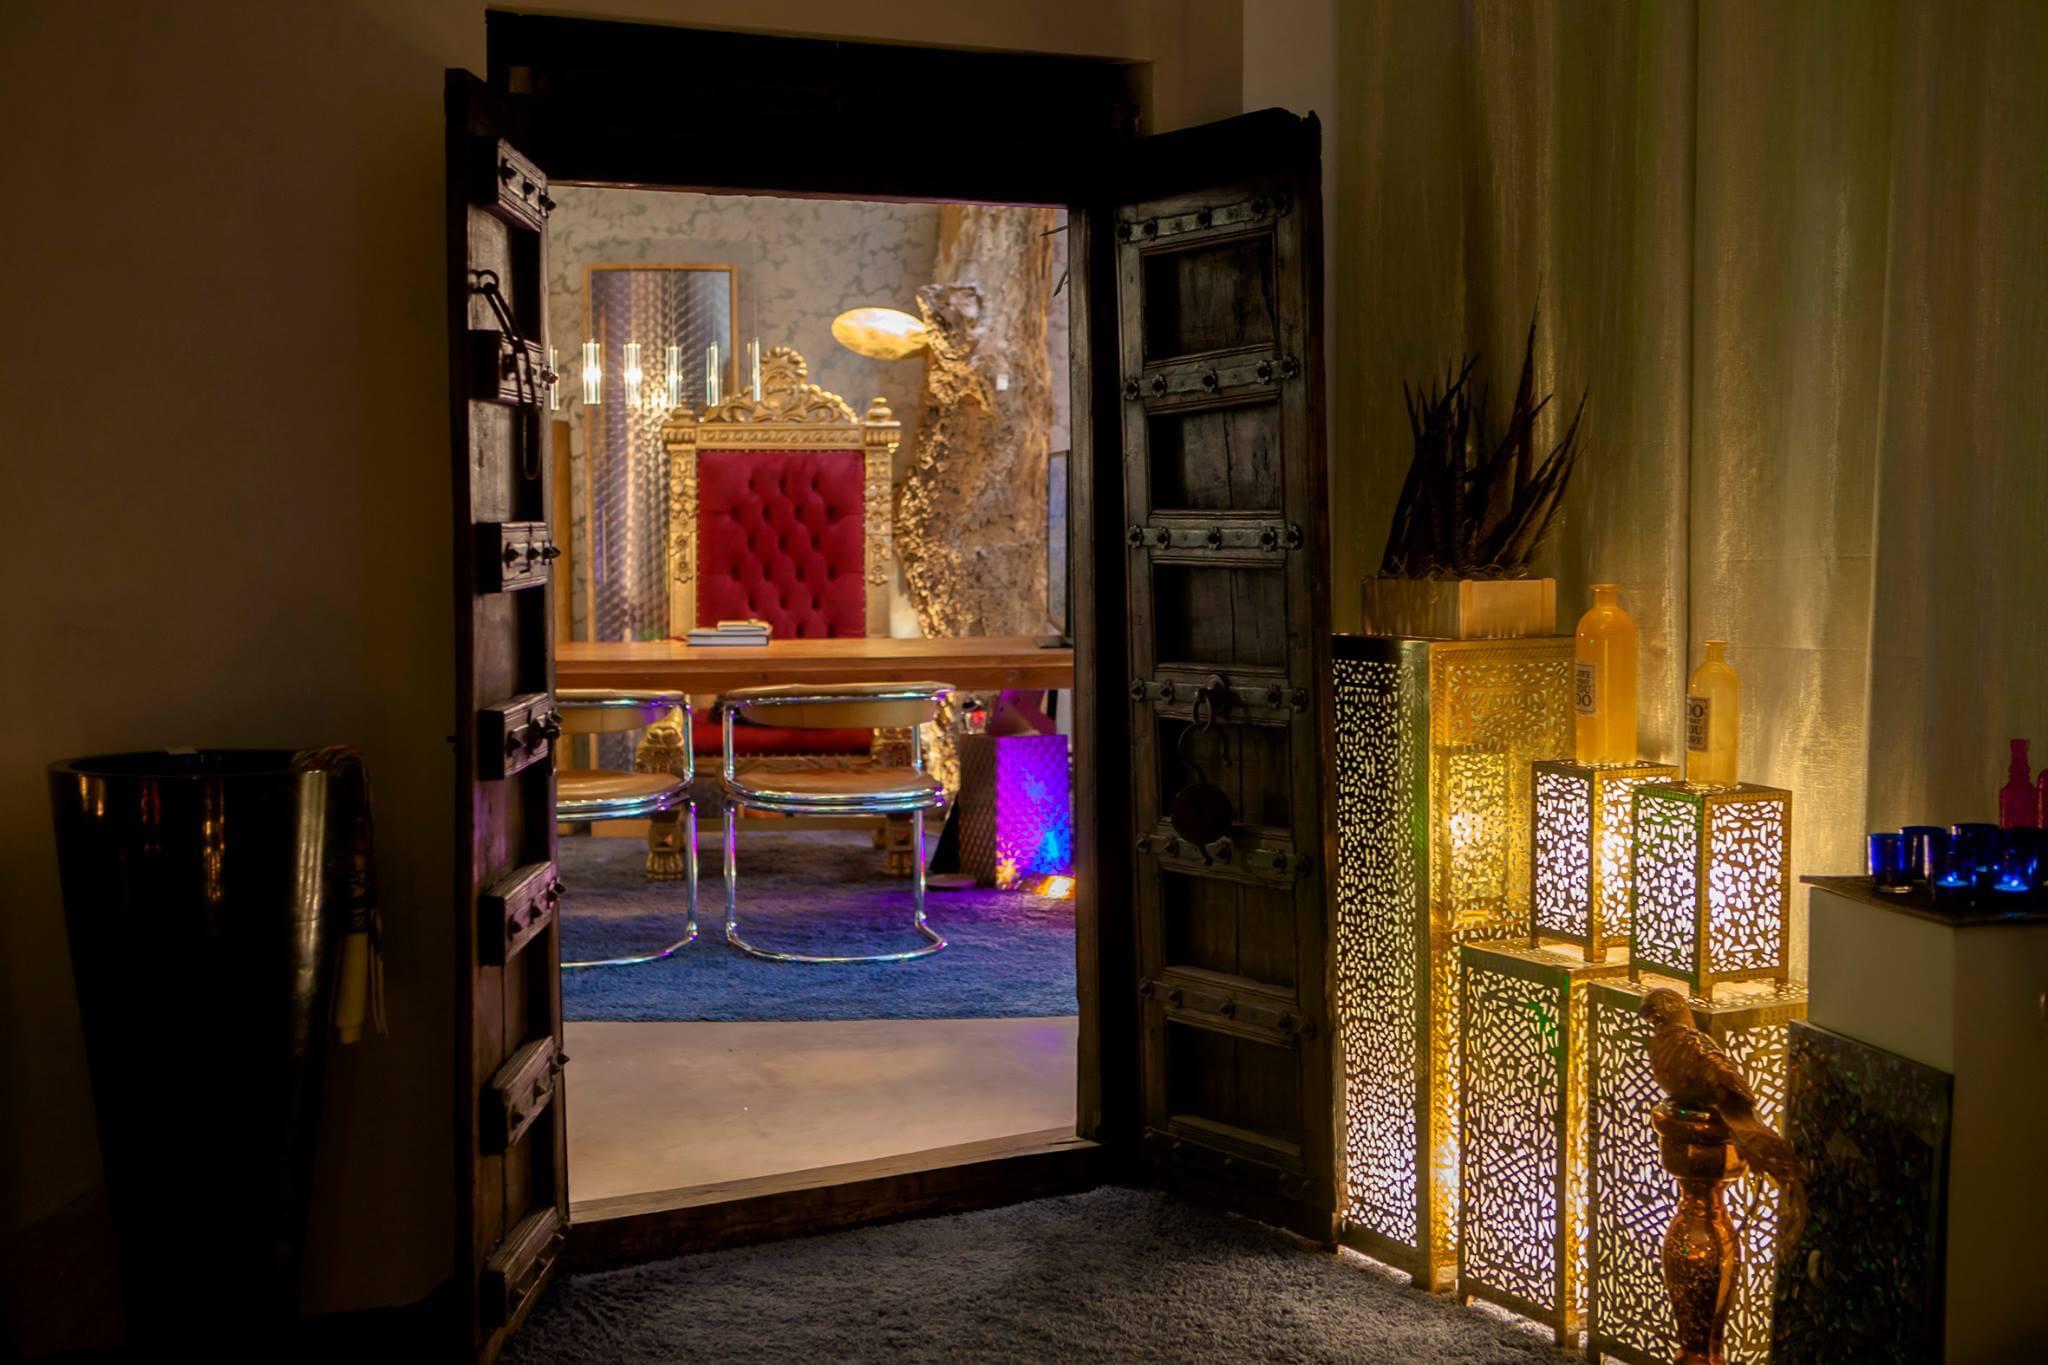 martinimarkt in bad honnef 2017 stadtfest f r die sinne. Black Bedroom Furniture Sets. Home Design Ideas